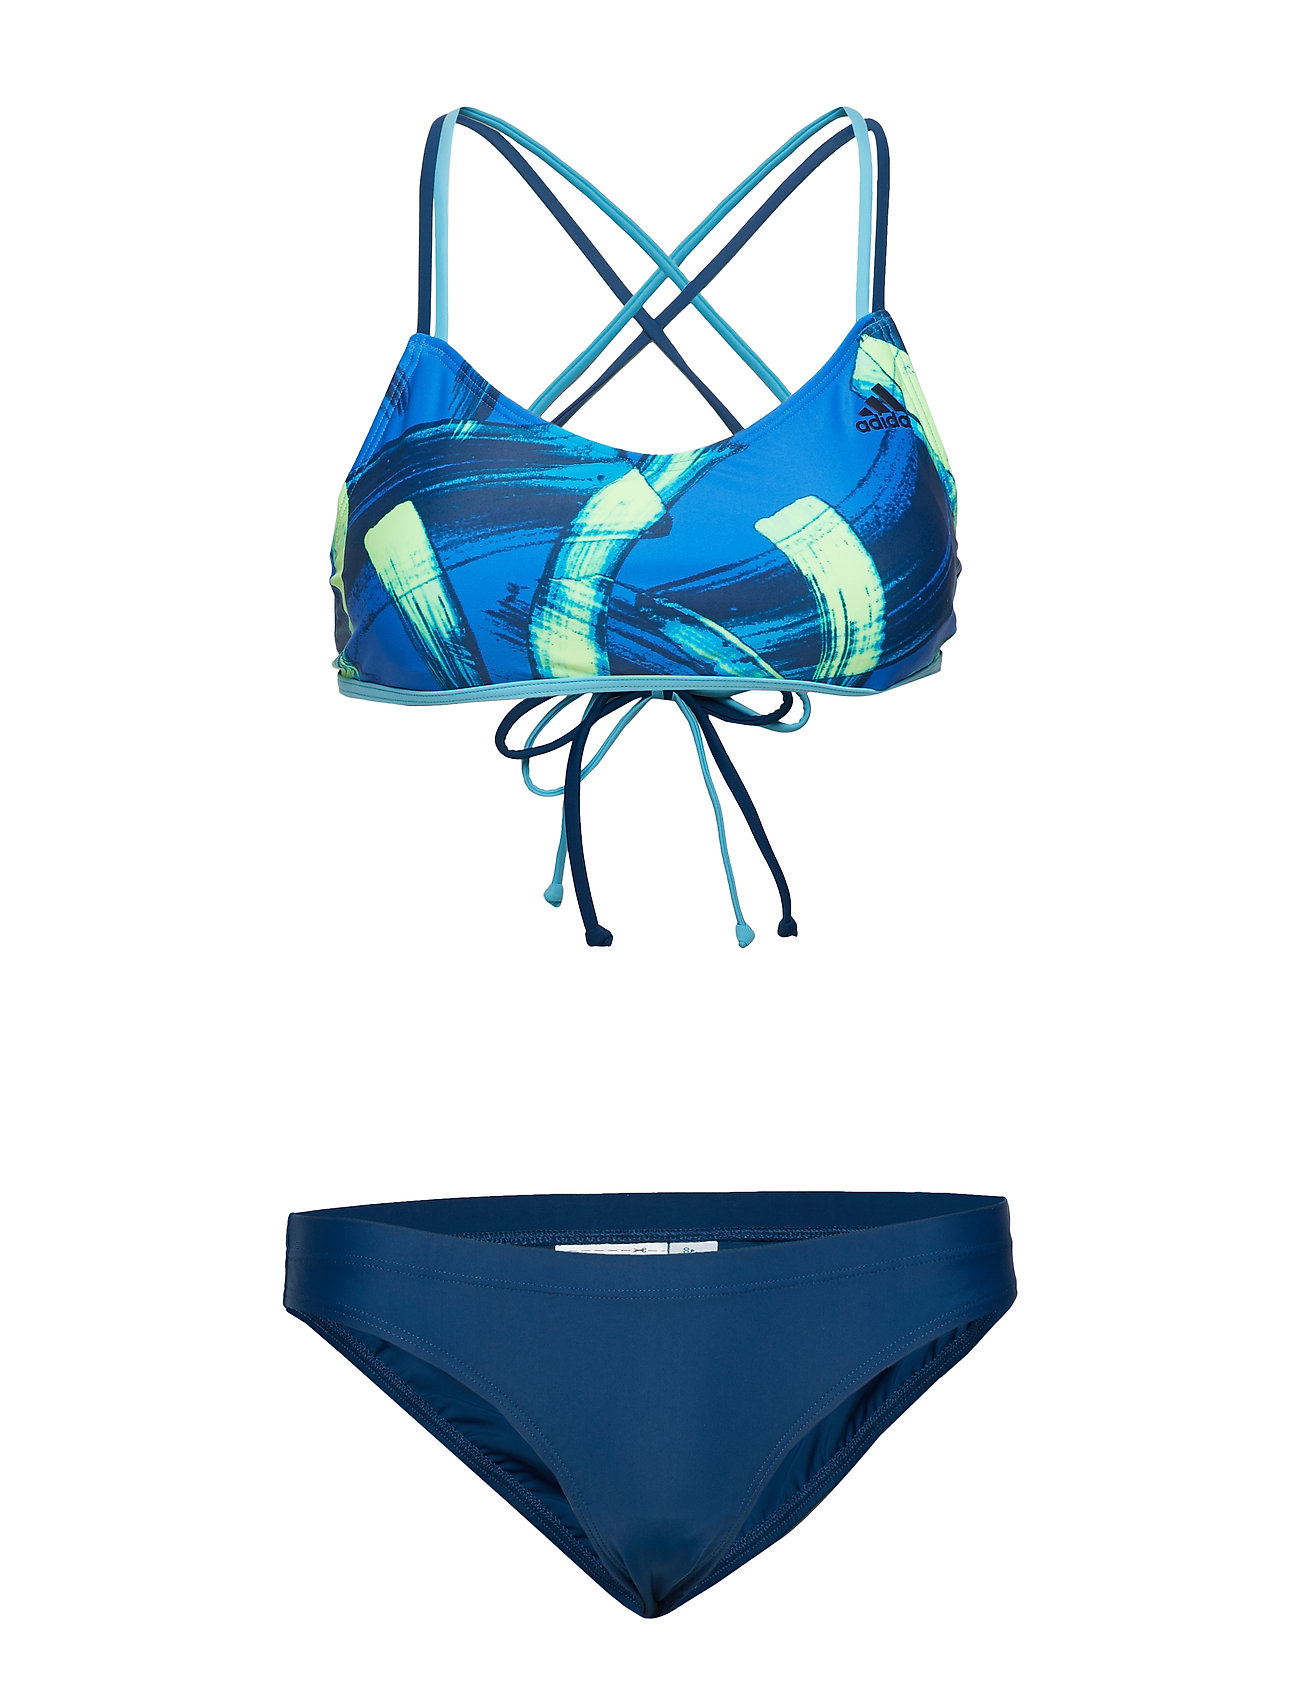 adidas Performance BW PARLEYC BIK - BLUE/HIREYE